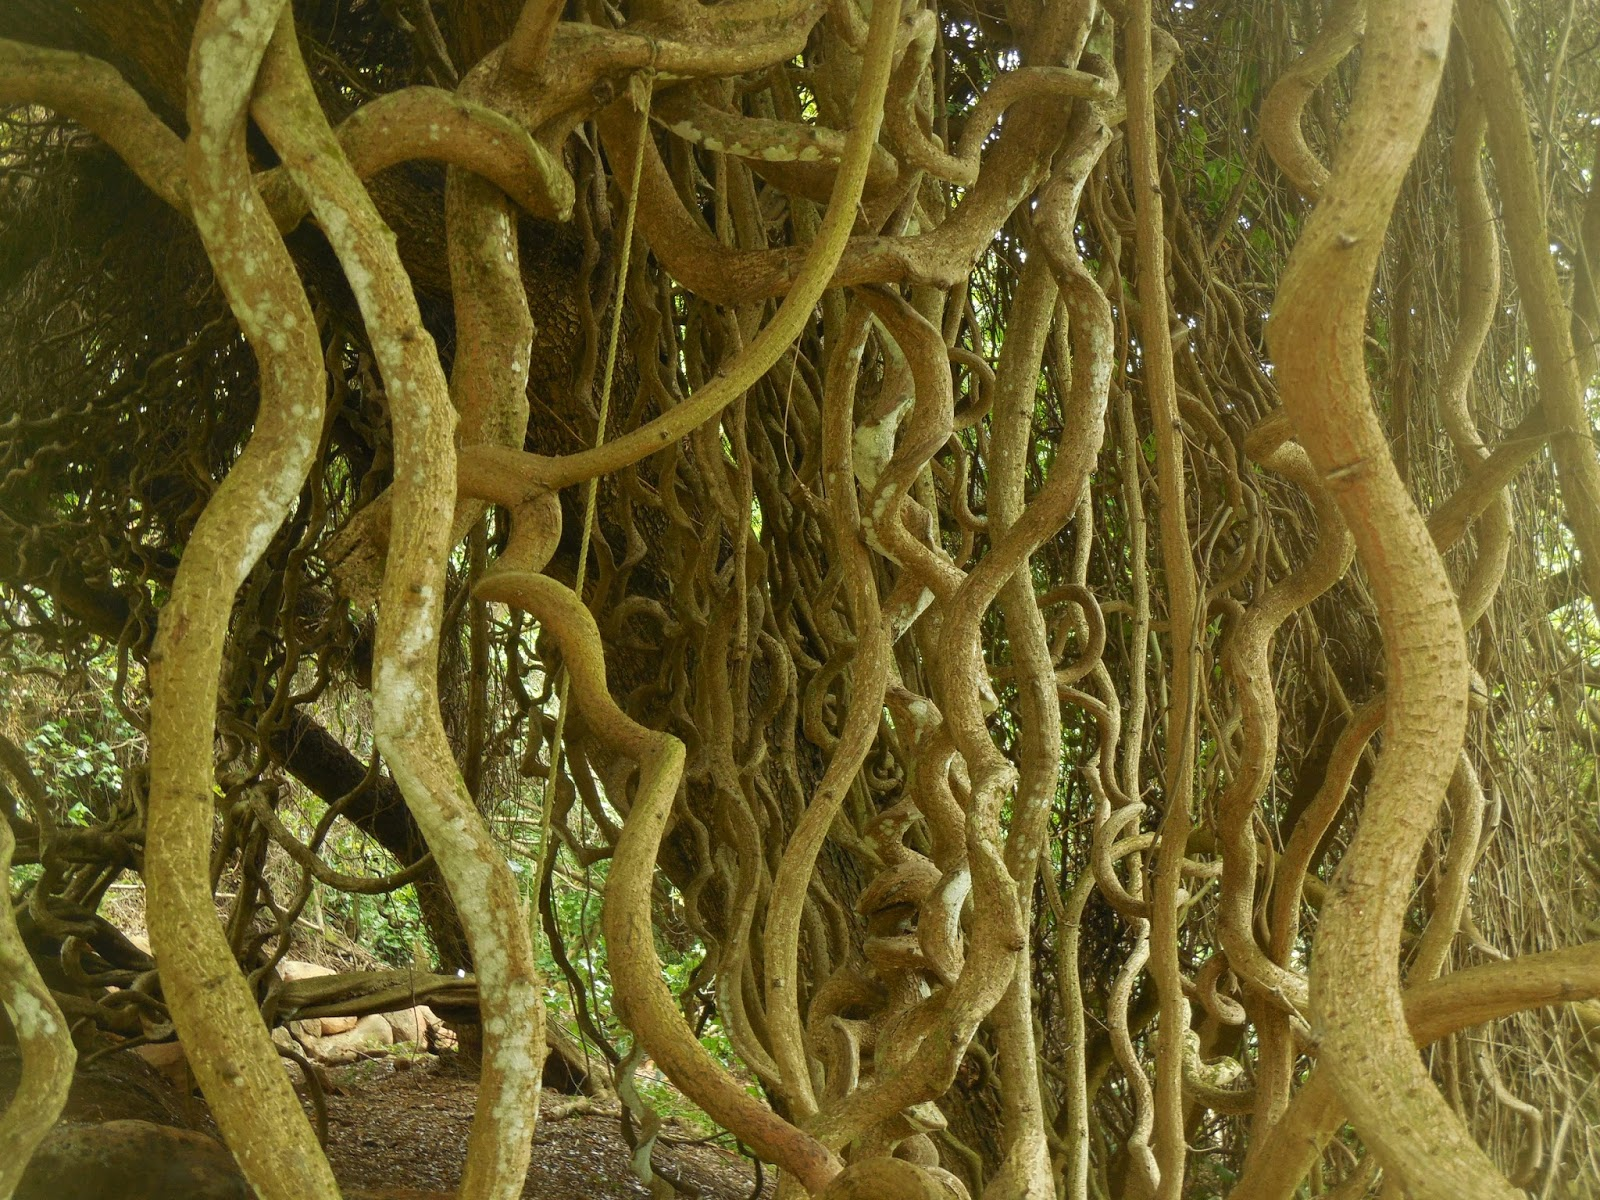 Wanderings of the old sloat: McBryde Garden on Kauai